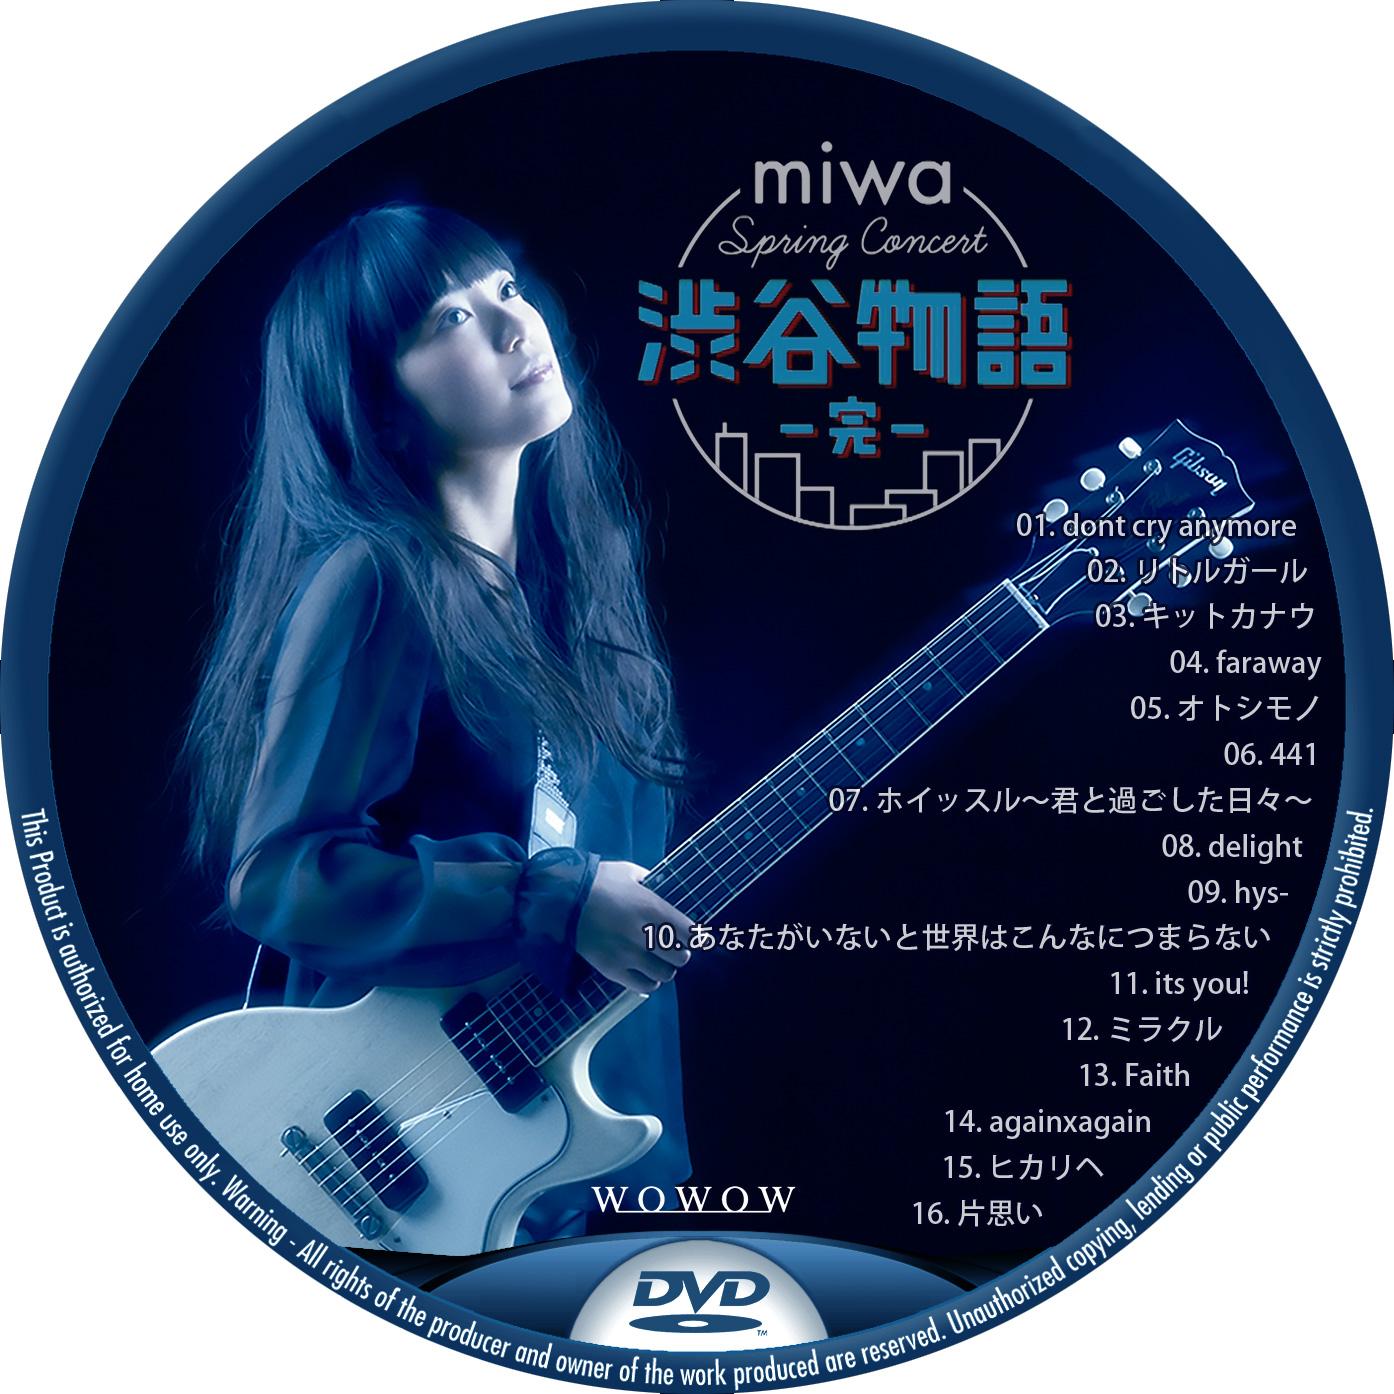 miwa Spring Concert 2014 DVDラベル